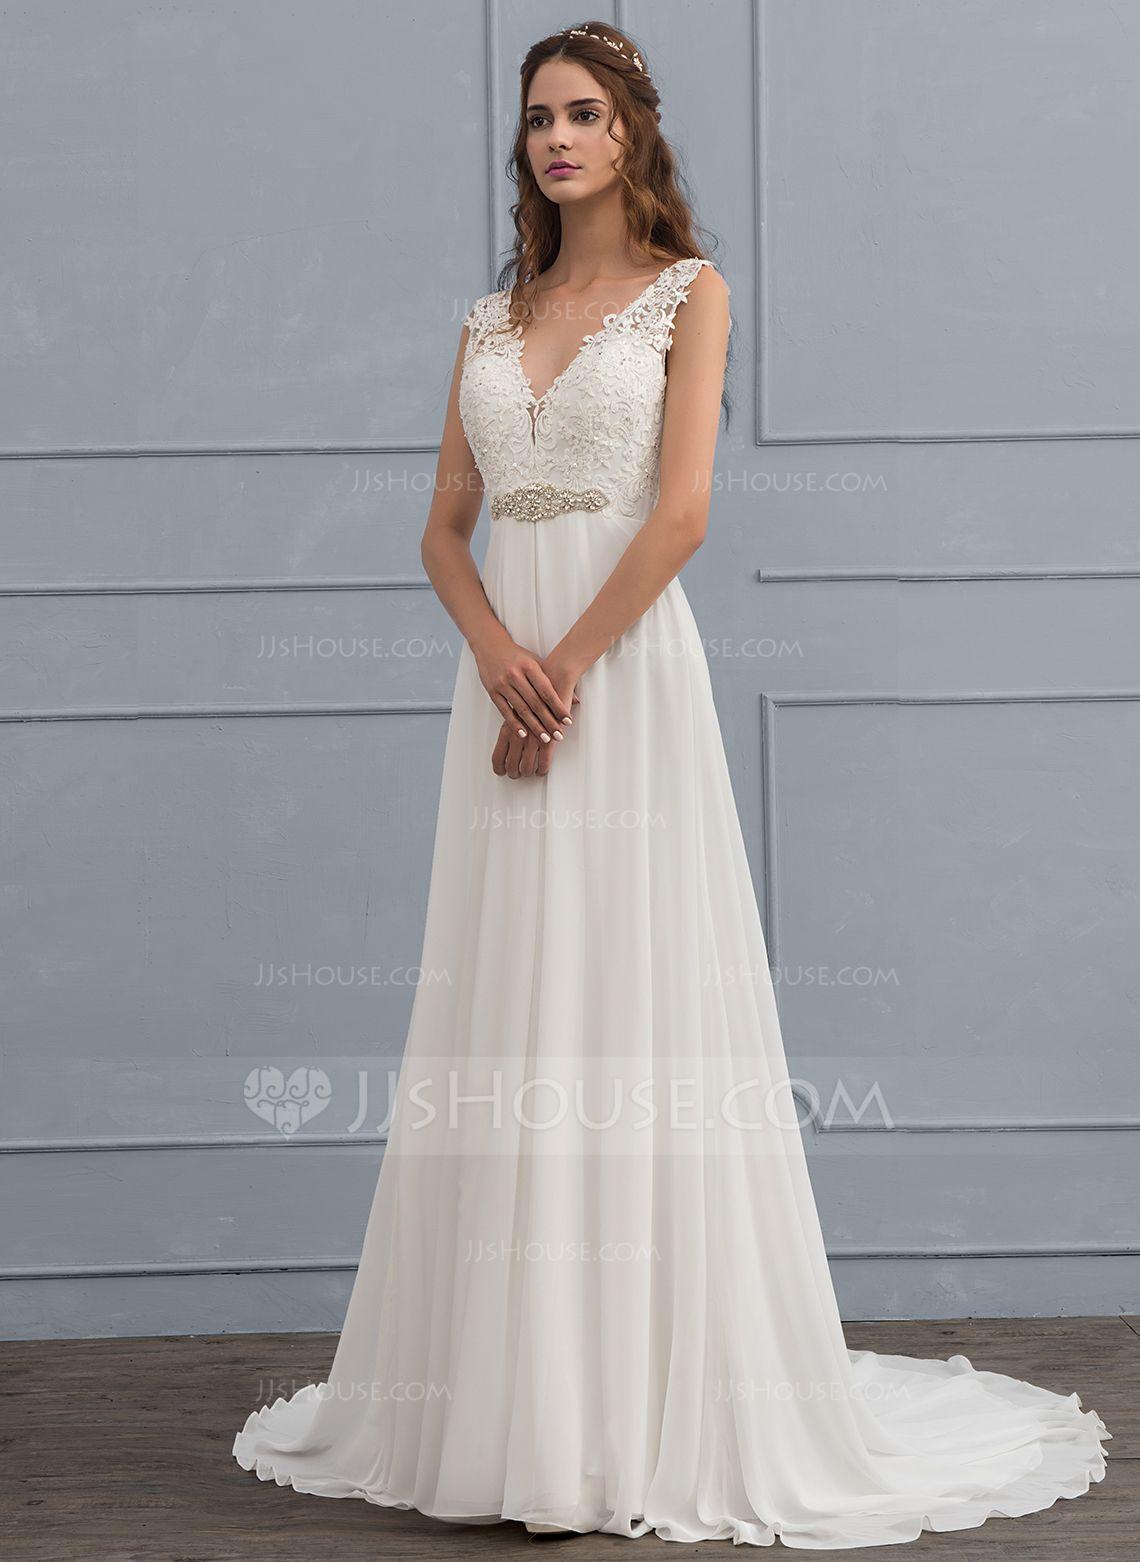 Fancy El Paso Wedding Dresses Ensign - All Wedding Dresses ...